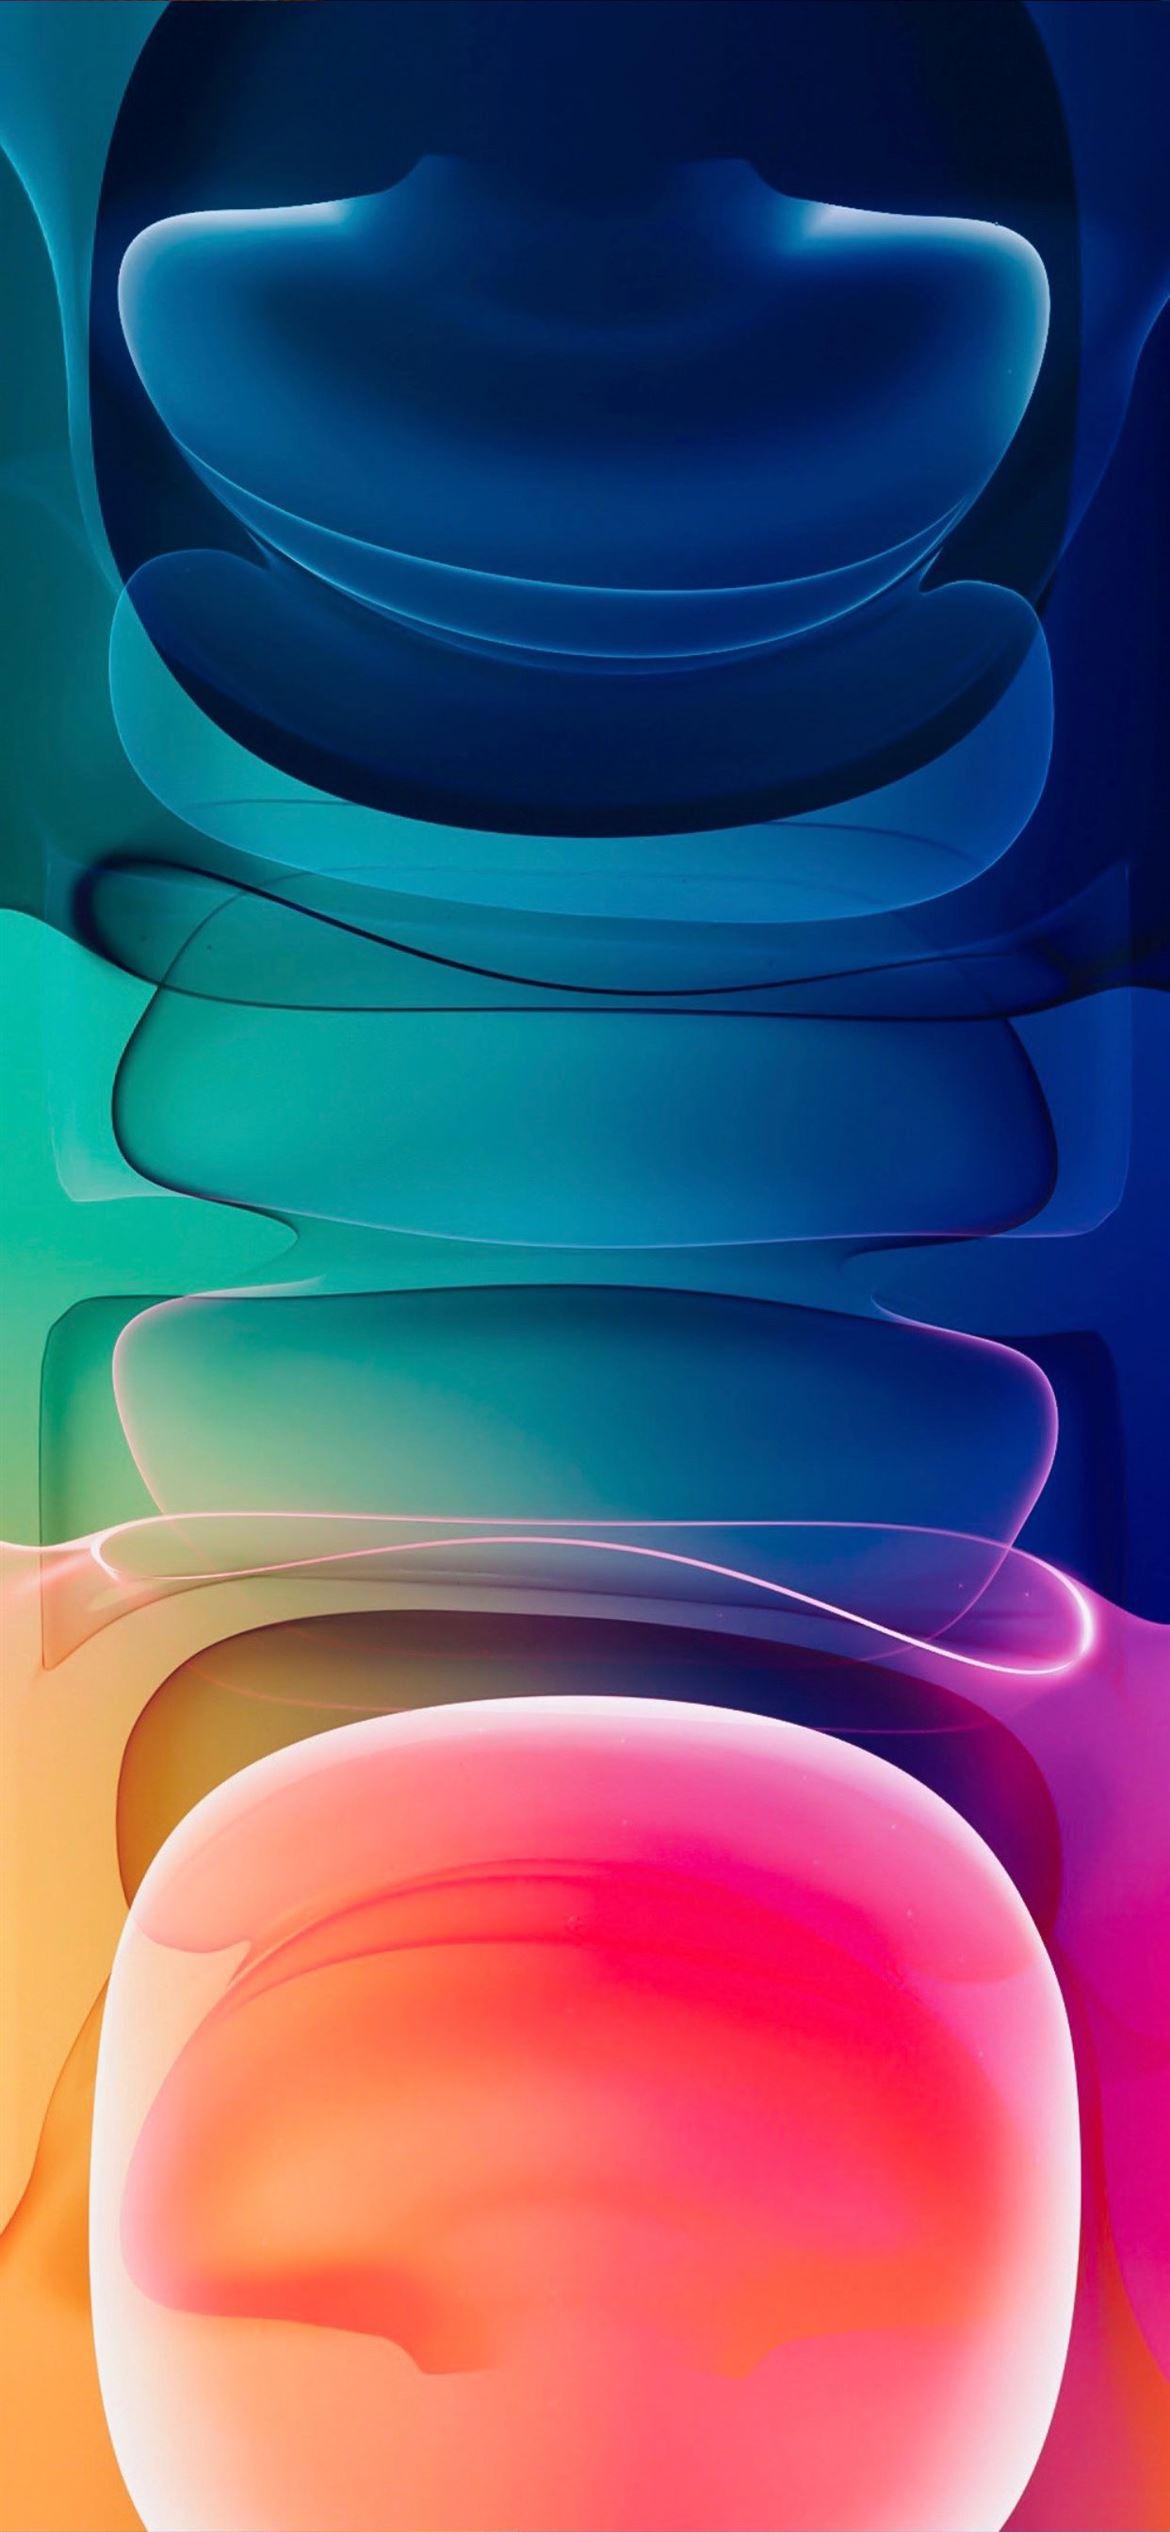 Best Aesthetic iPhone 12 Wallpapers HD [2020]   iLikeWallpaper 1170x2532